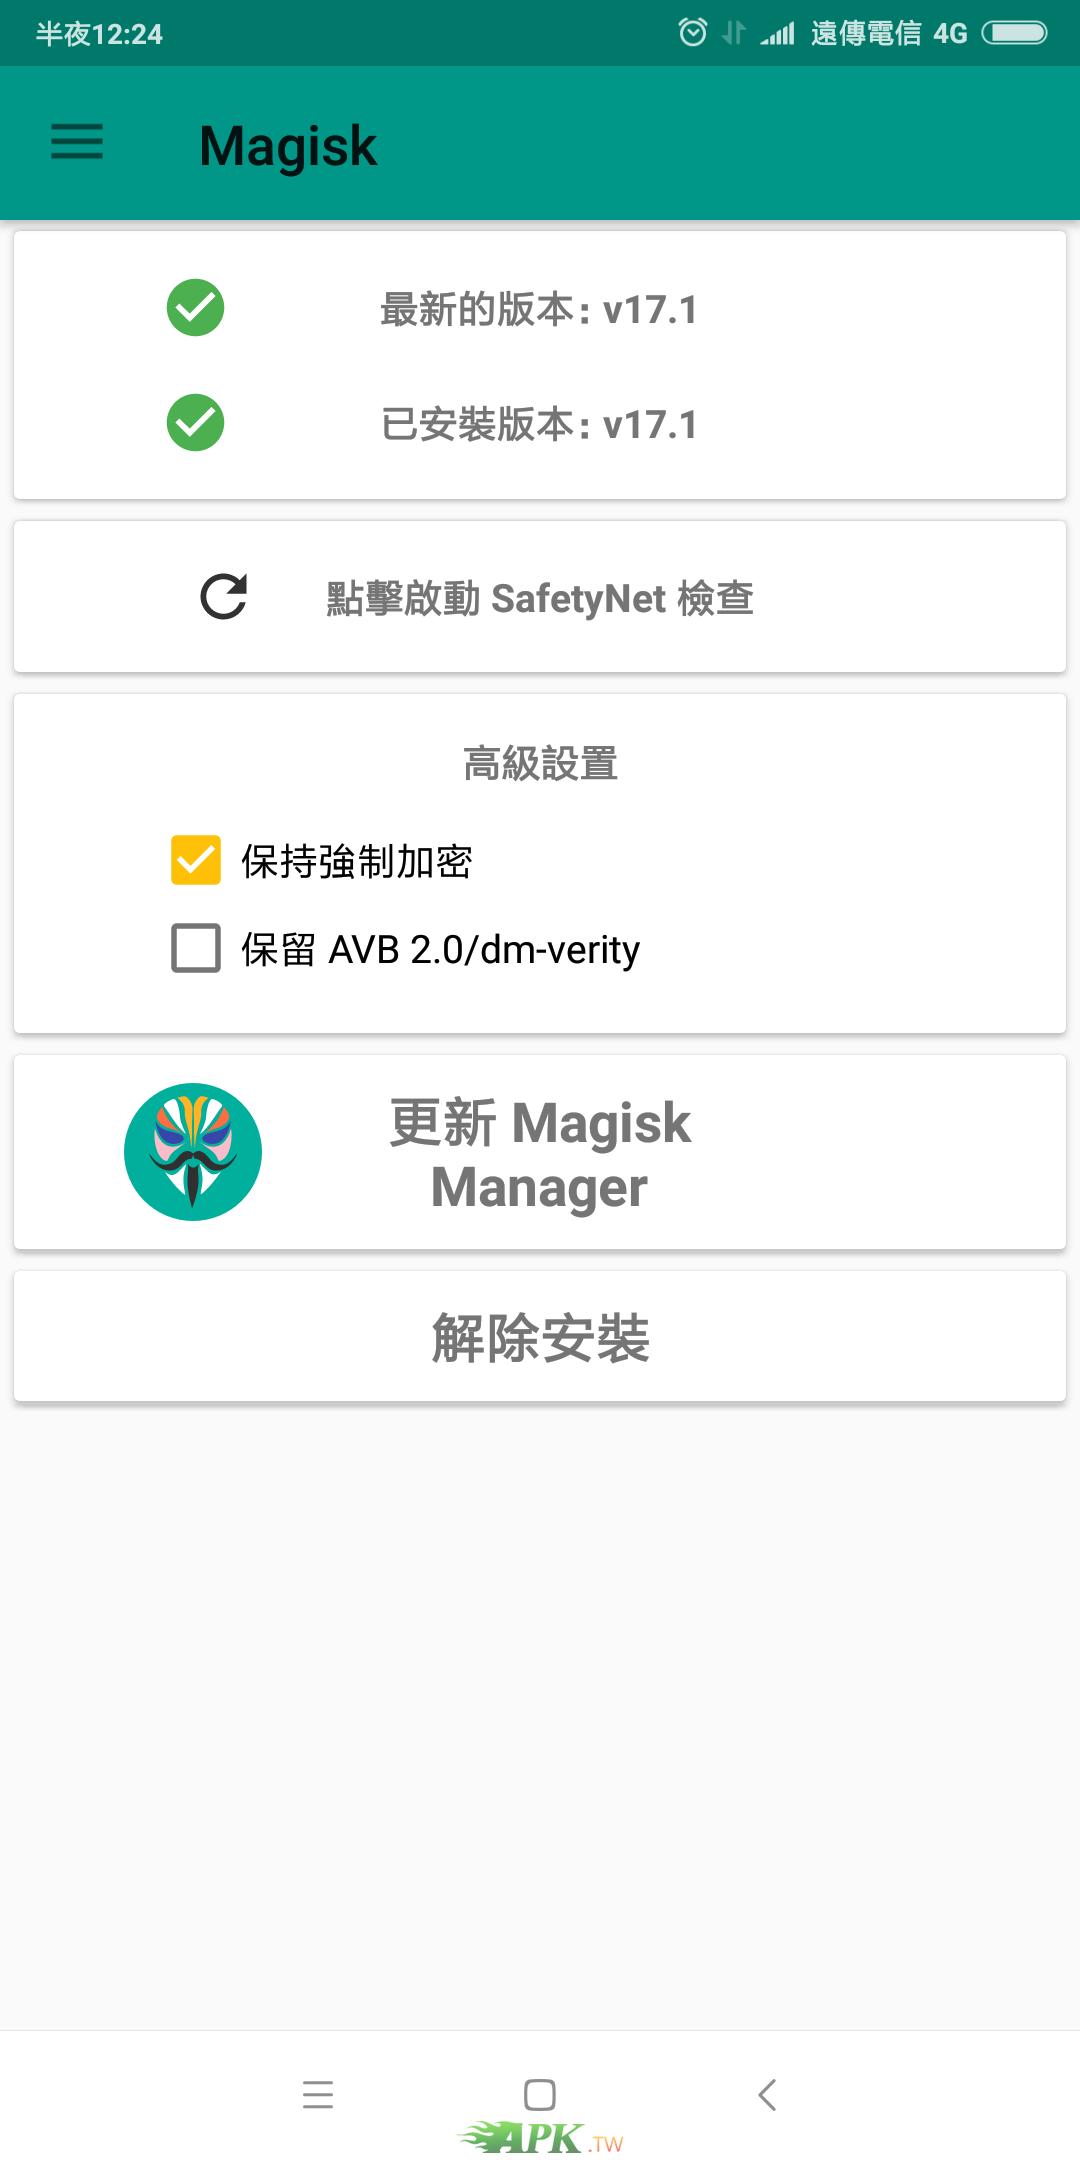 Screenshot_2018-10-12-00-24-14-316_com.topjohnwu.magisk.png